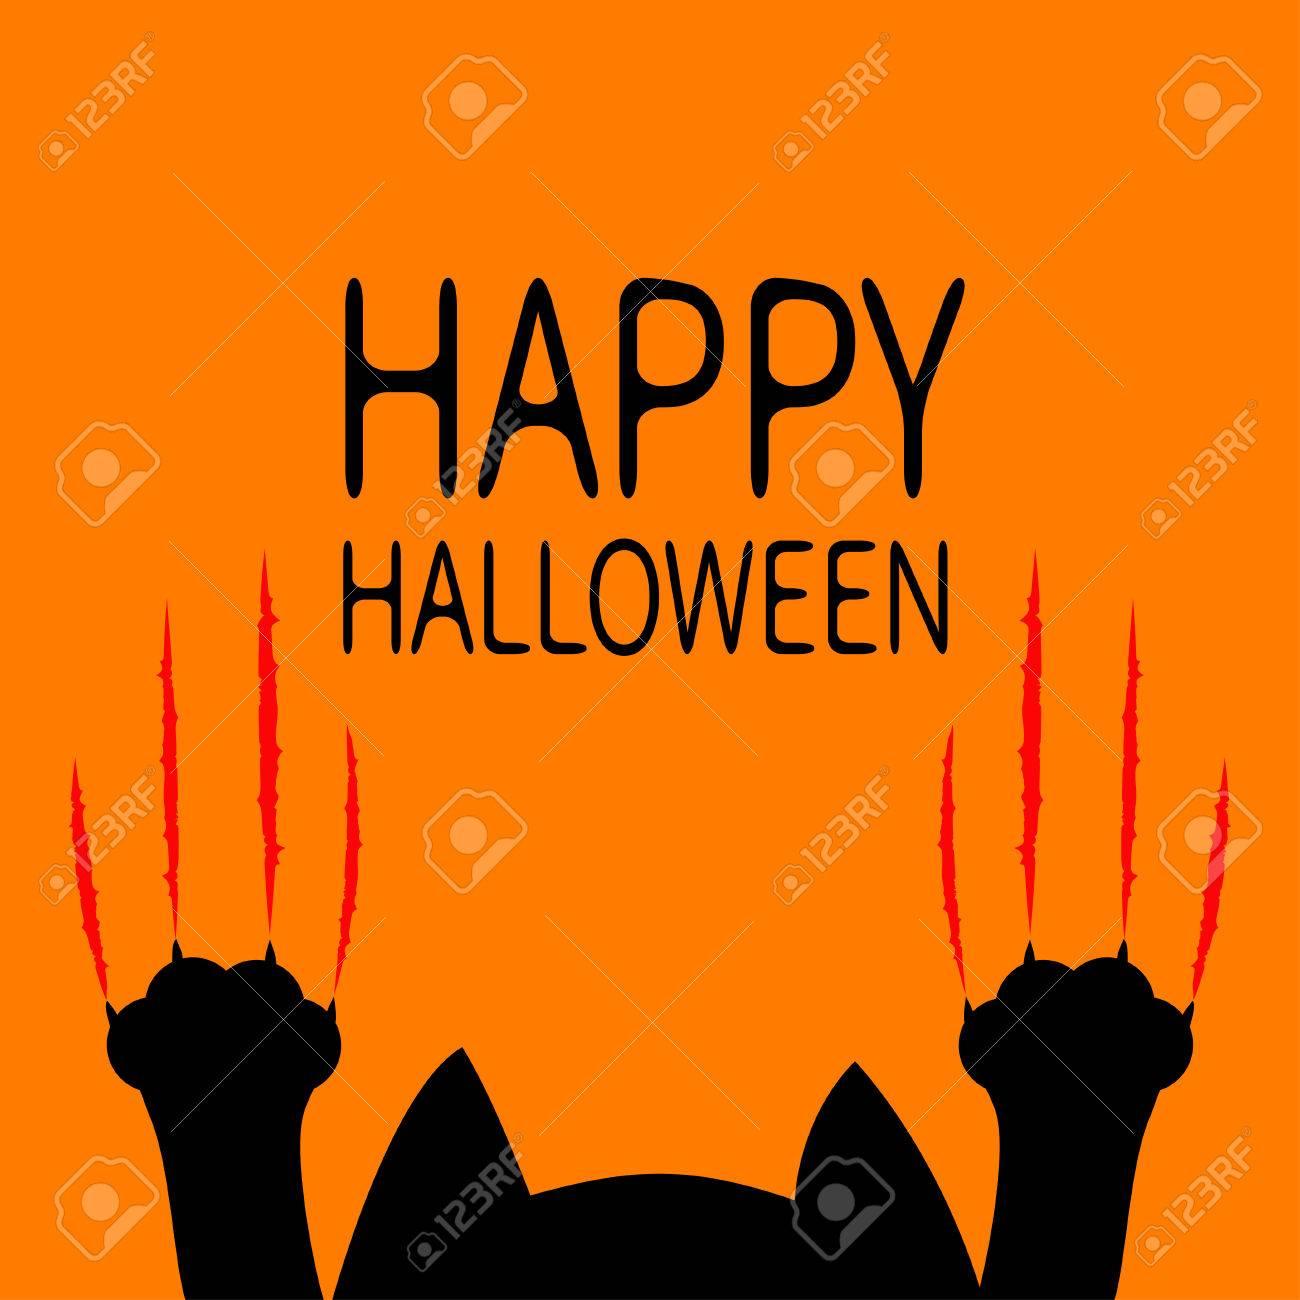 happy halloween card black cat paw print head silhouette red